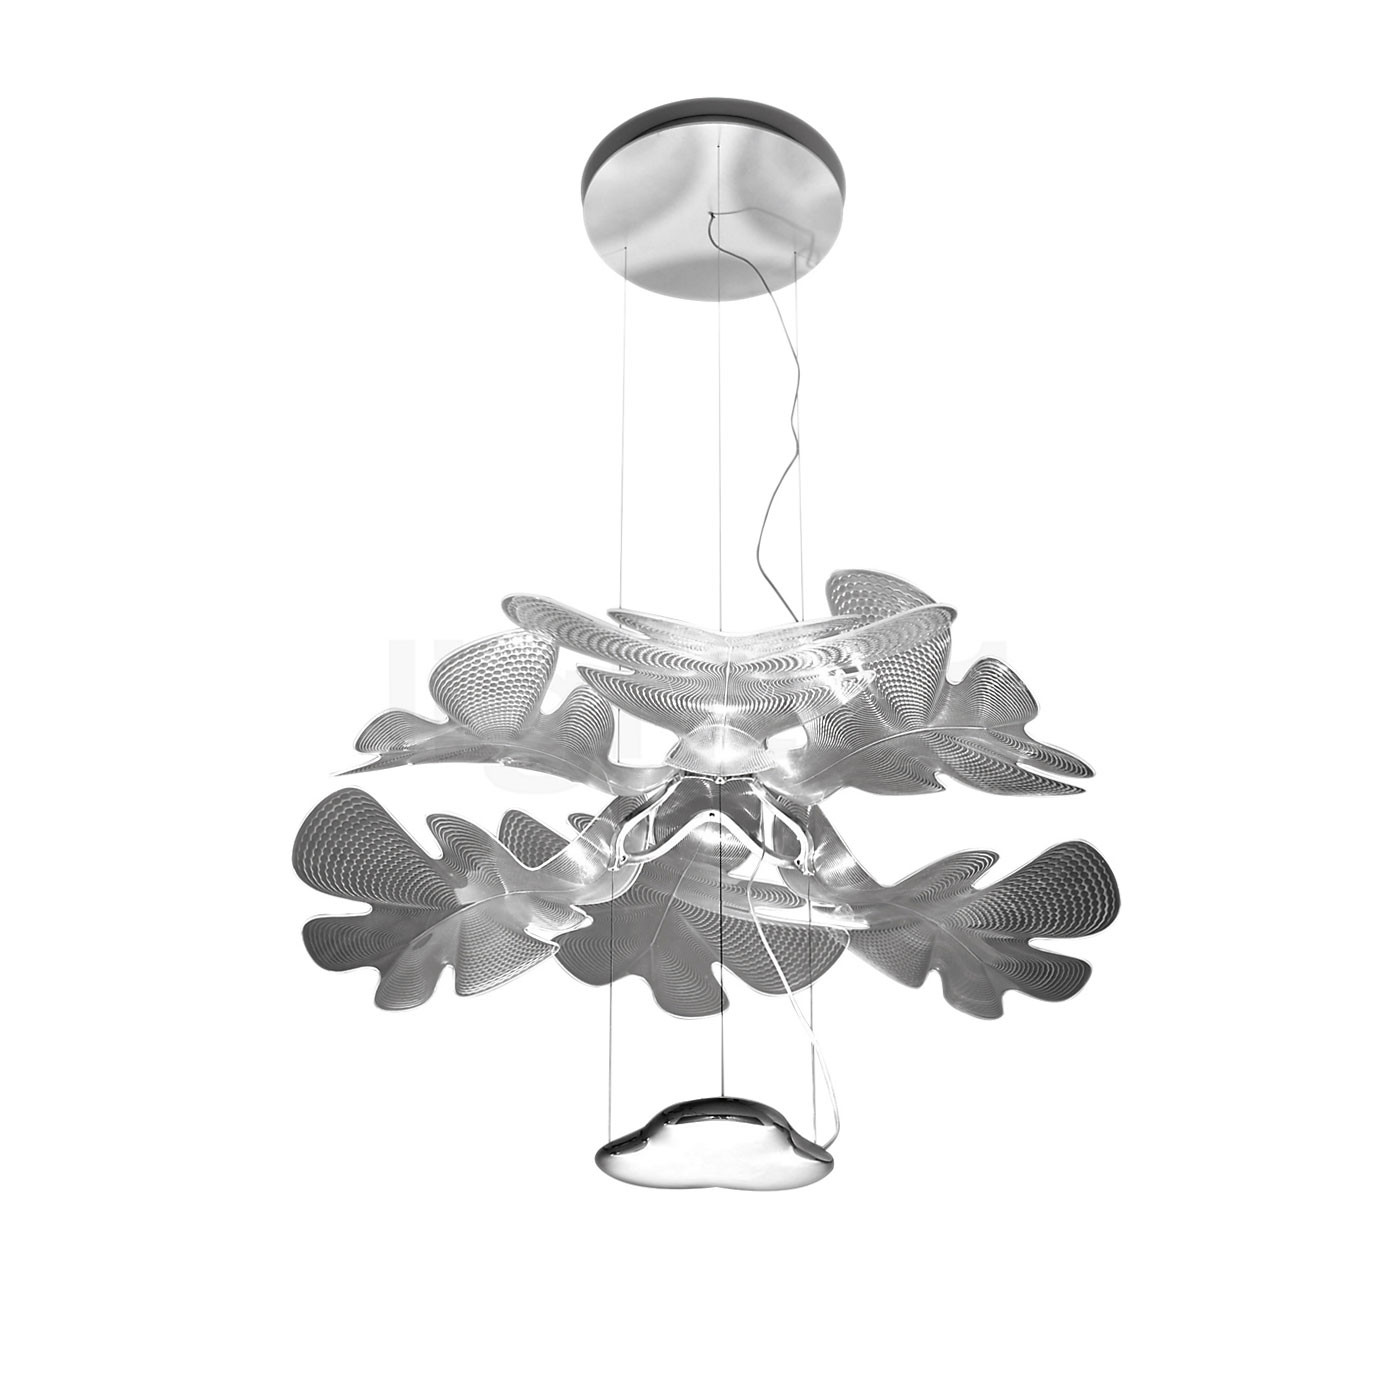 Artemide Chlorophilia Sospensione LED